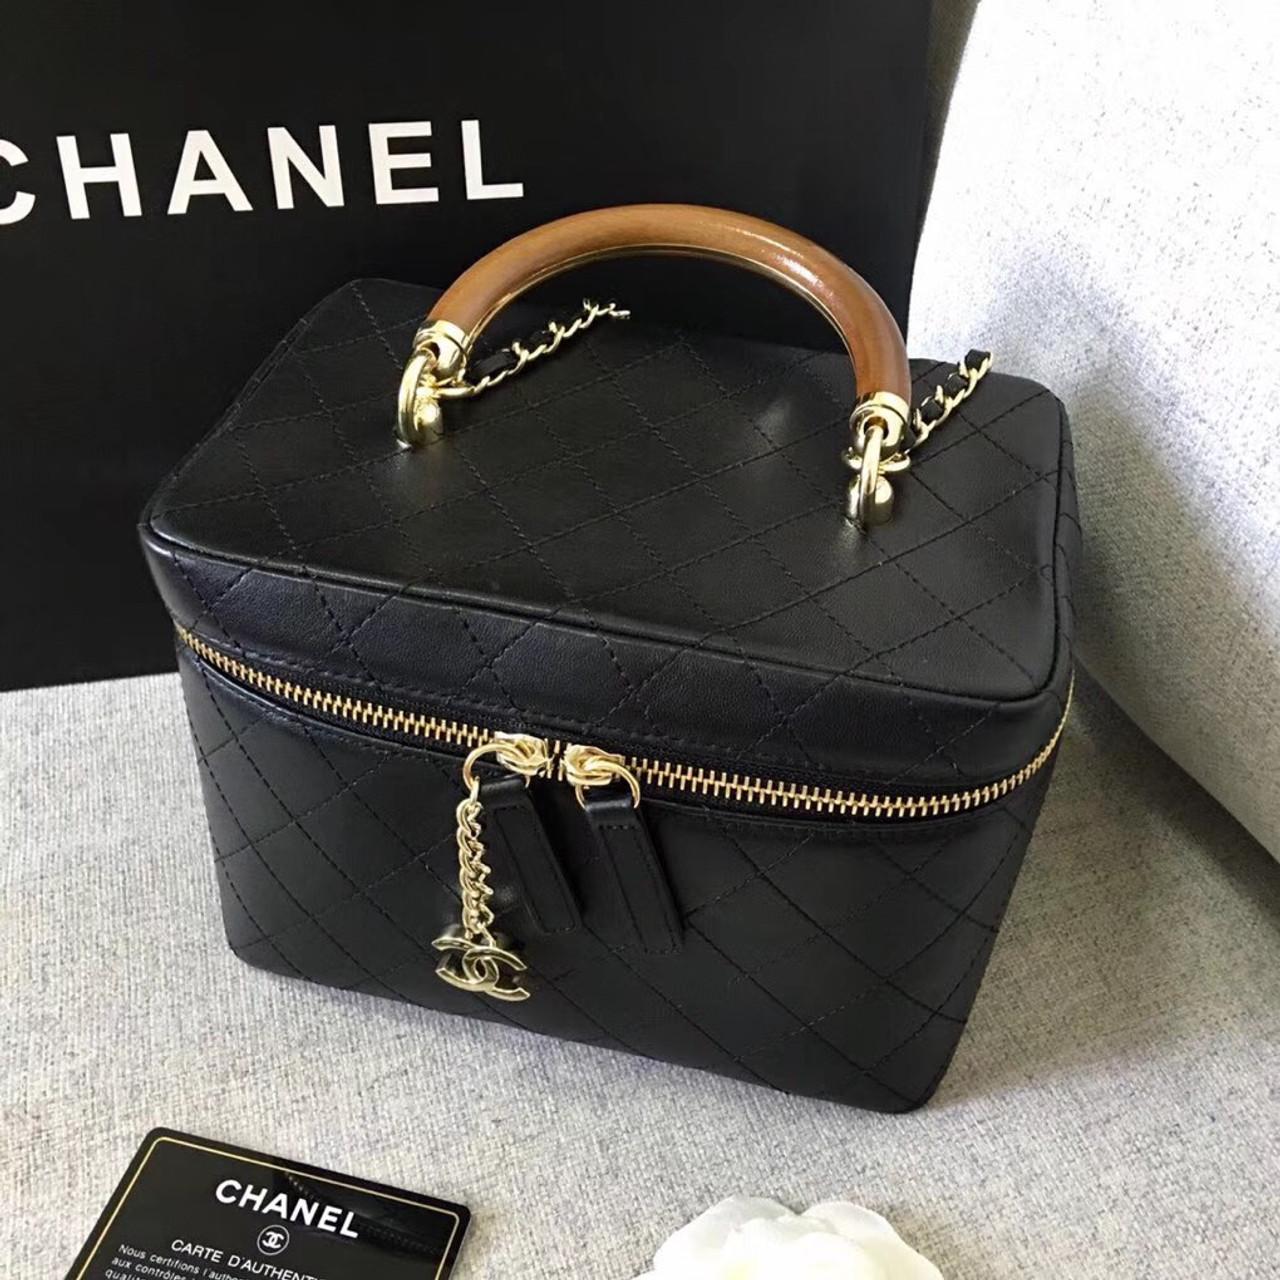 Chanel Vintage Vanity Case Black 2018 2019 Bella Vita Moda